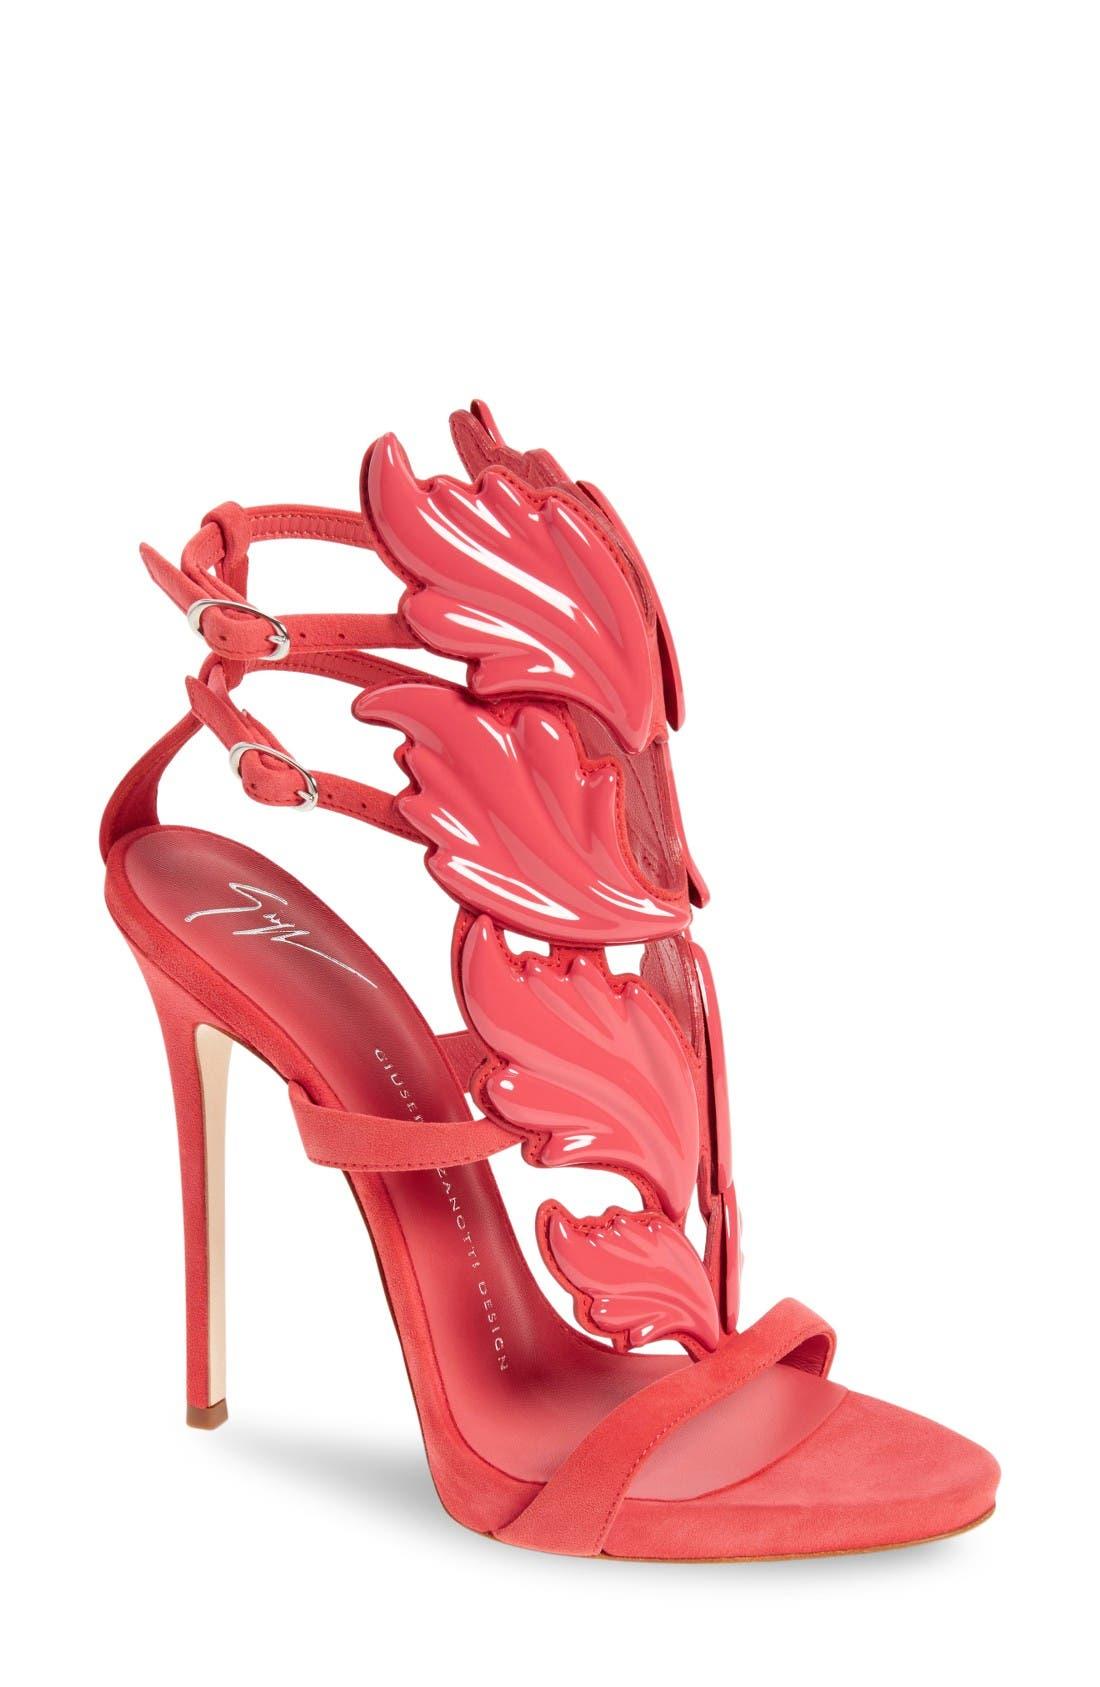 Alternate Image 1 Selected - Giuseppe Zanotti 'Coline' Winged Sandal (Women)